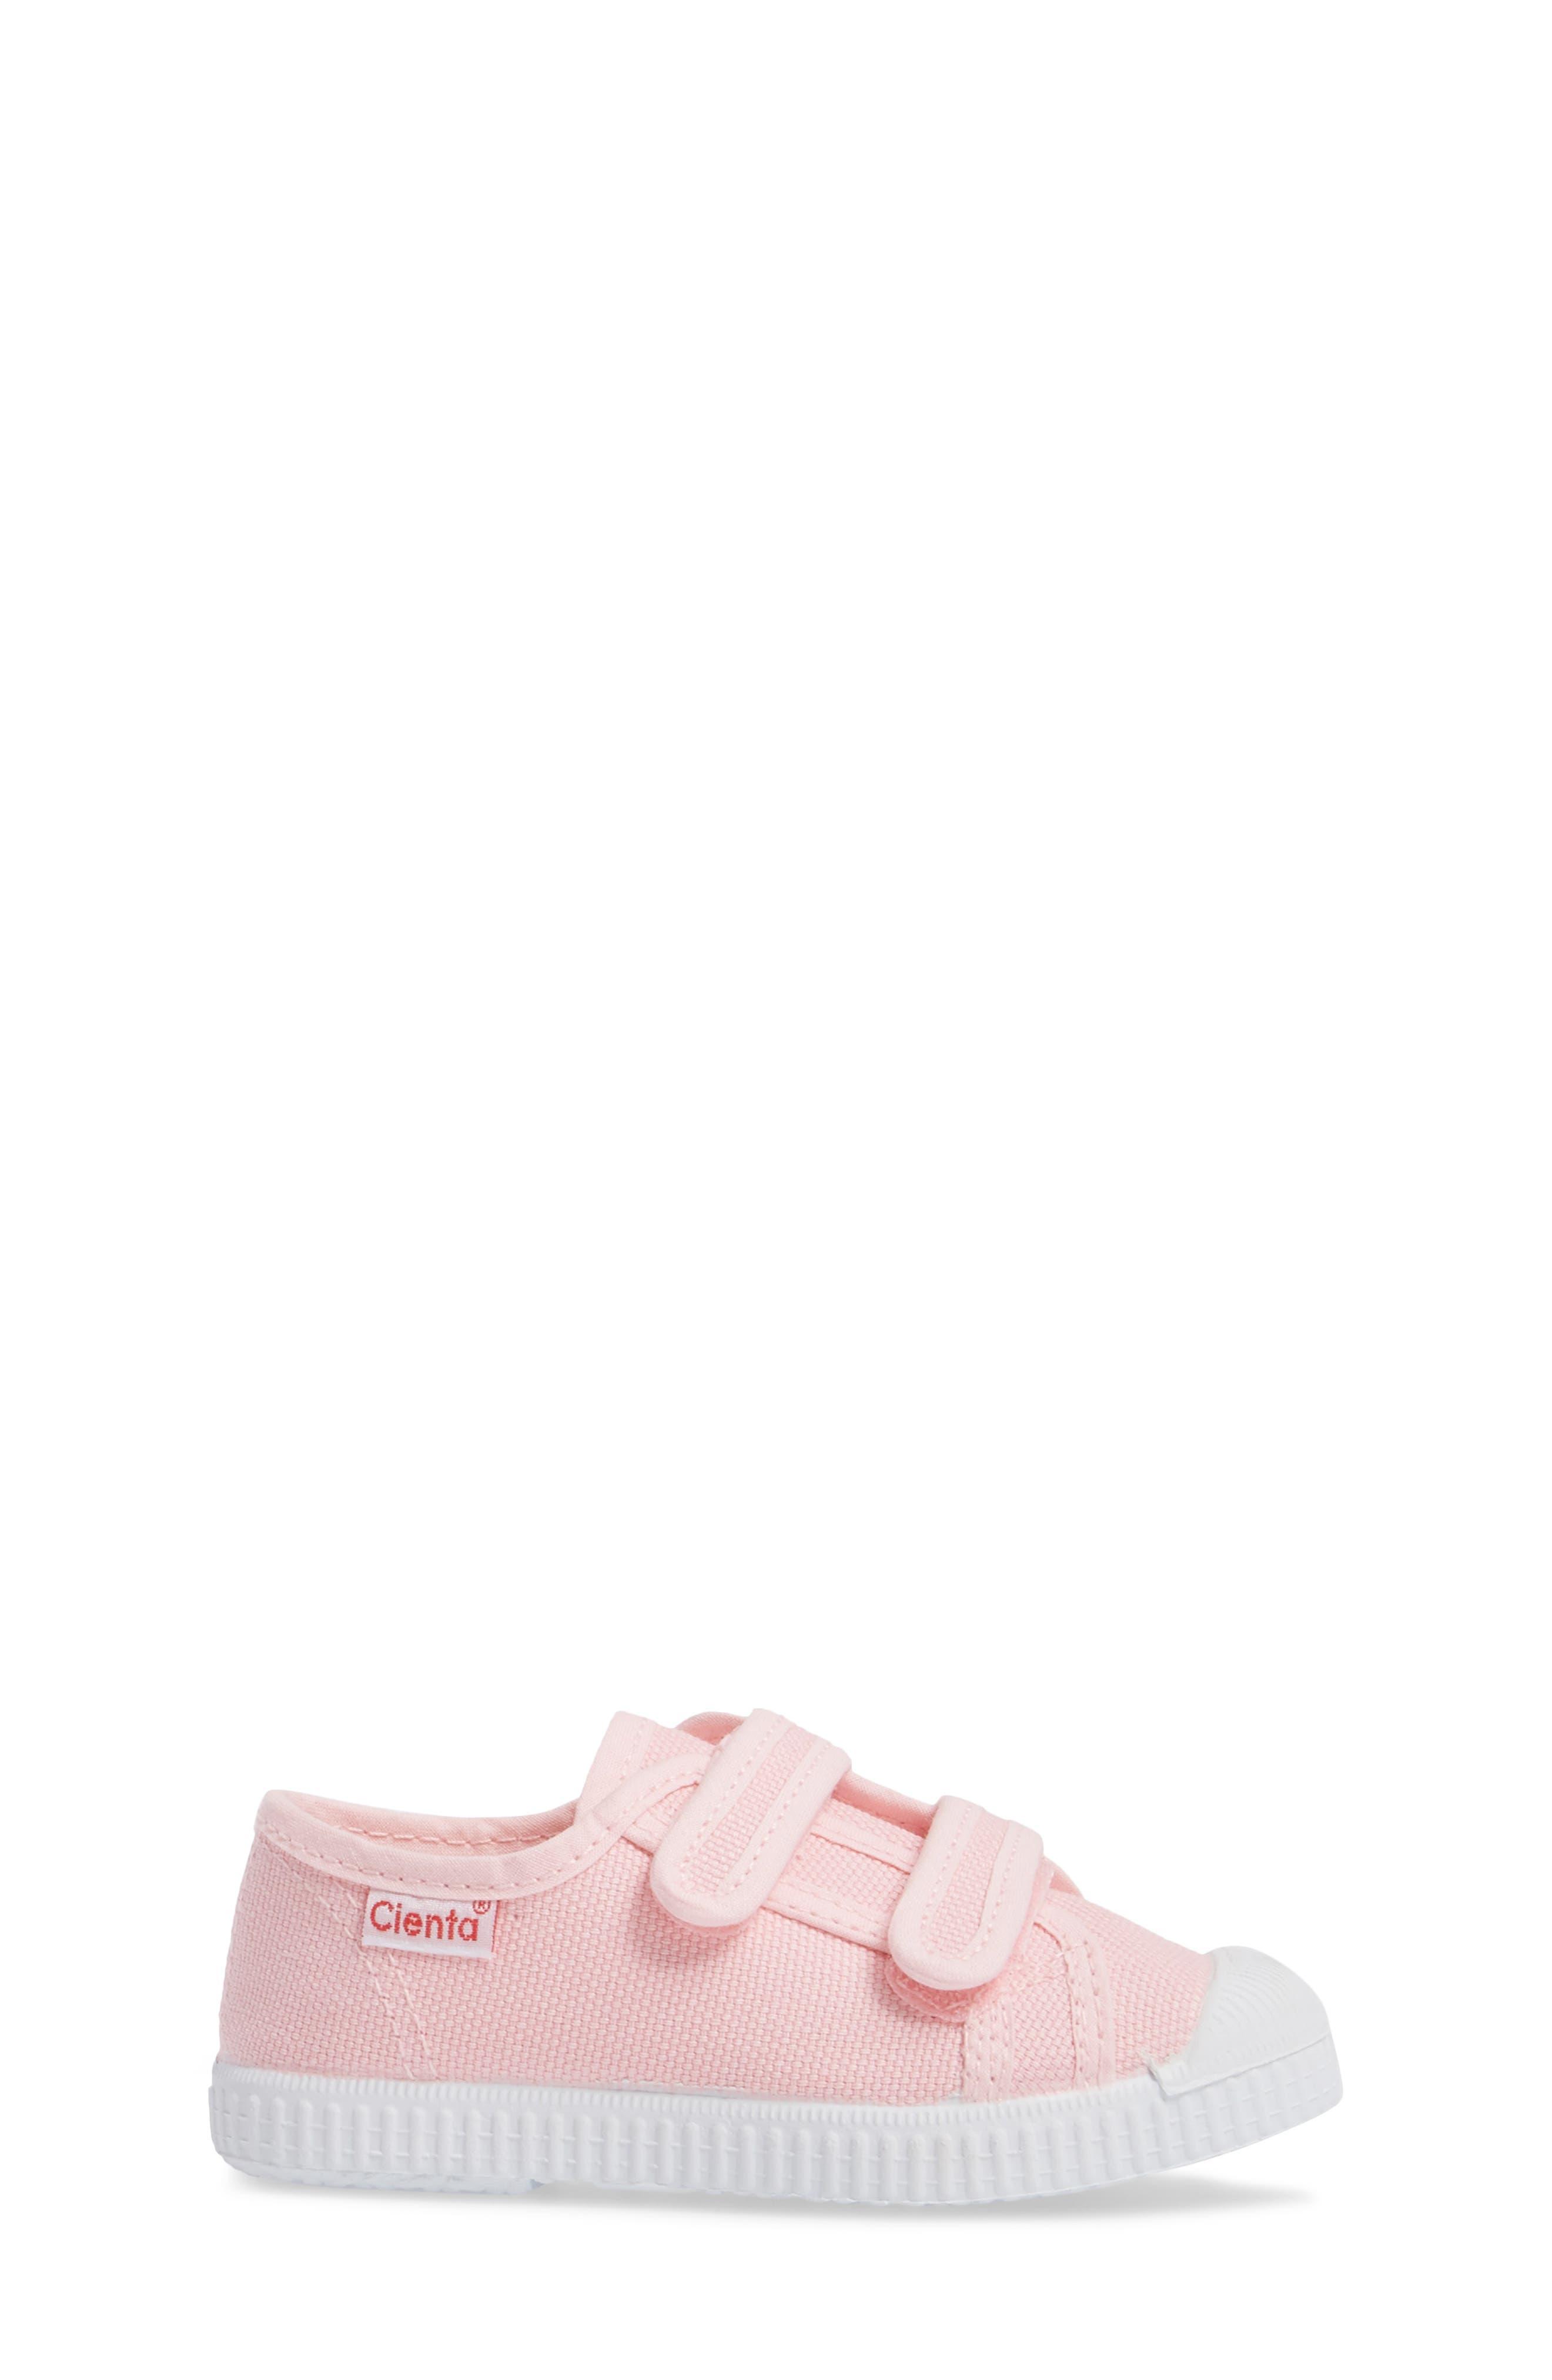 Alternate Image 3  - Cienta Canvas Sneaker (Walker & Toddler)